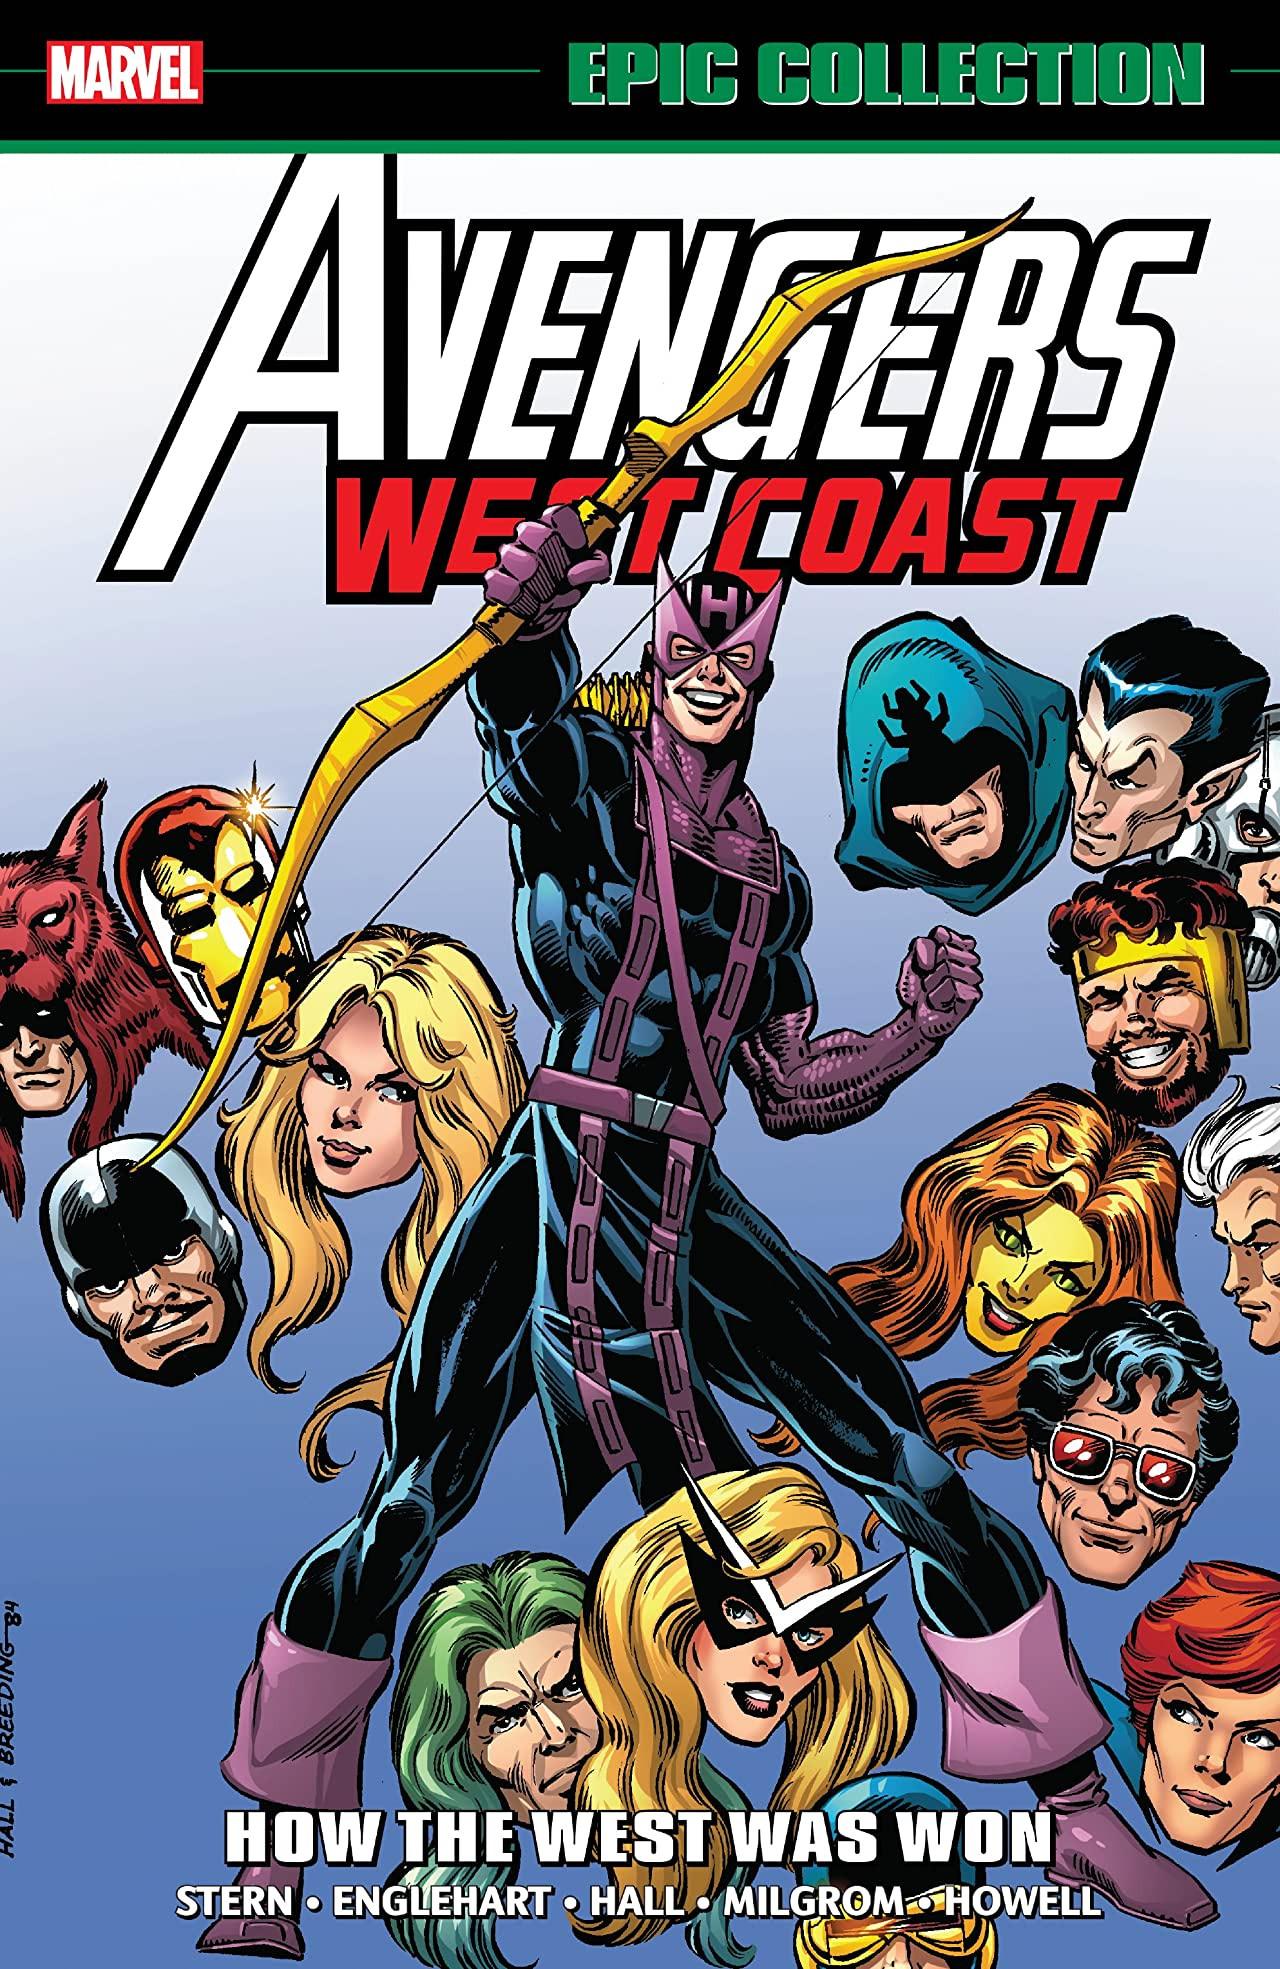 Epic Collection: Avengers West Coast Vol 1